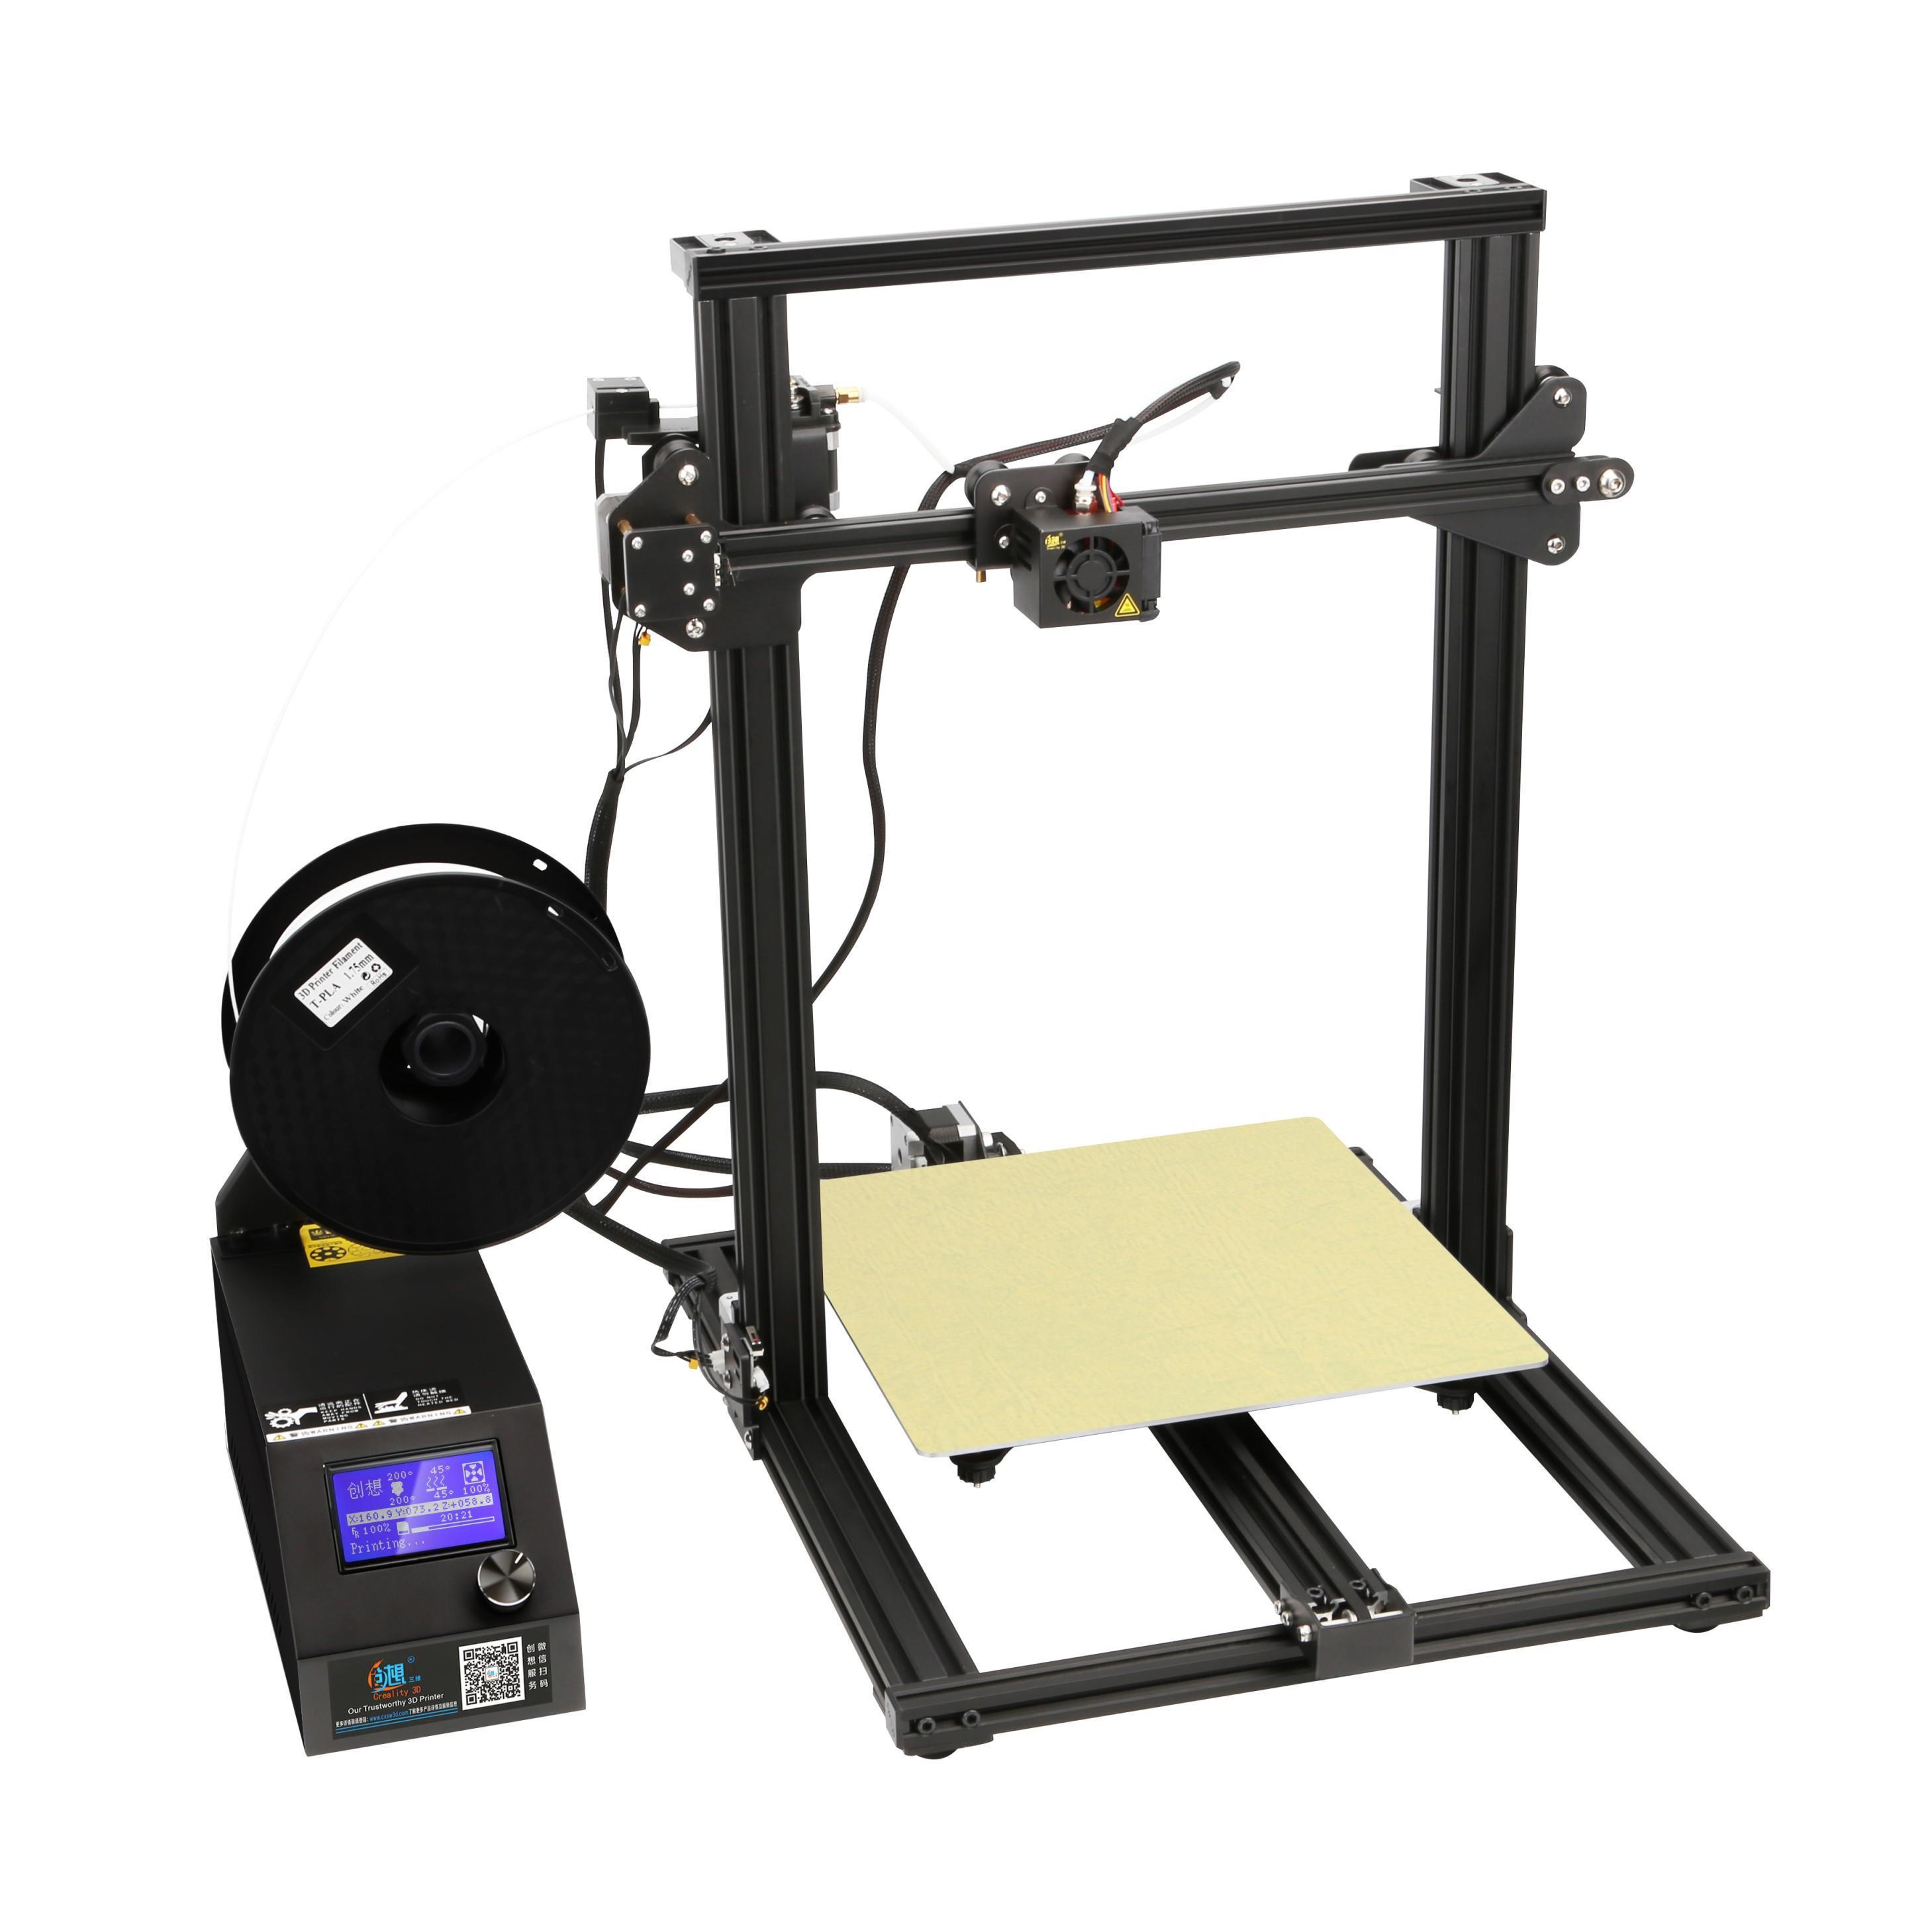 Creality CR-10(S) 3D Printer (Black)